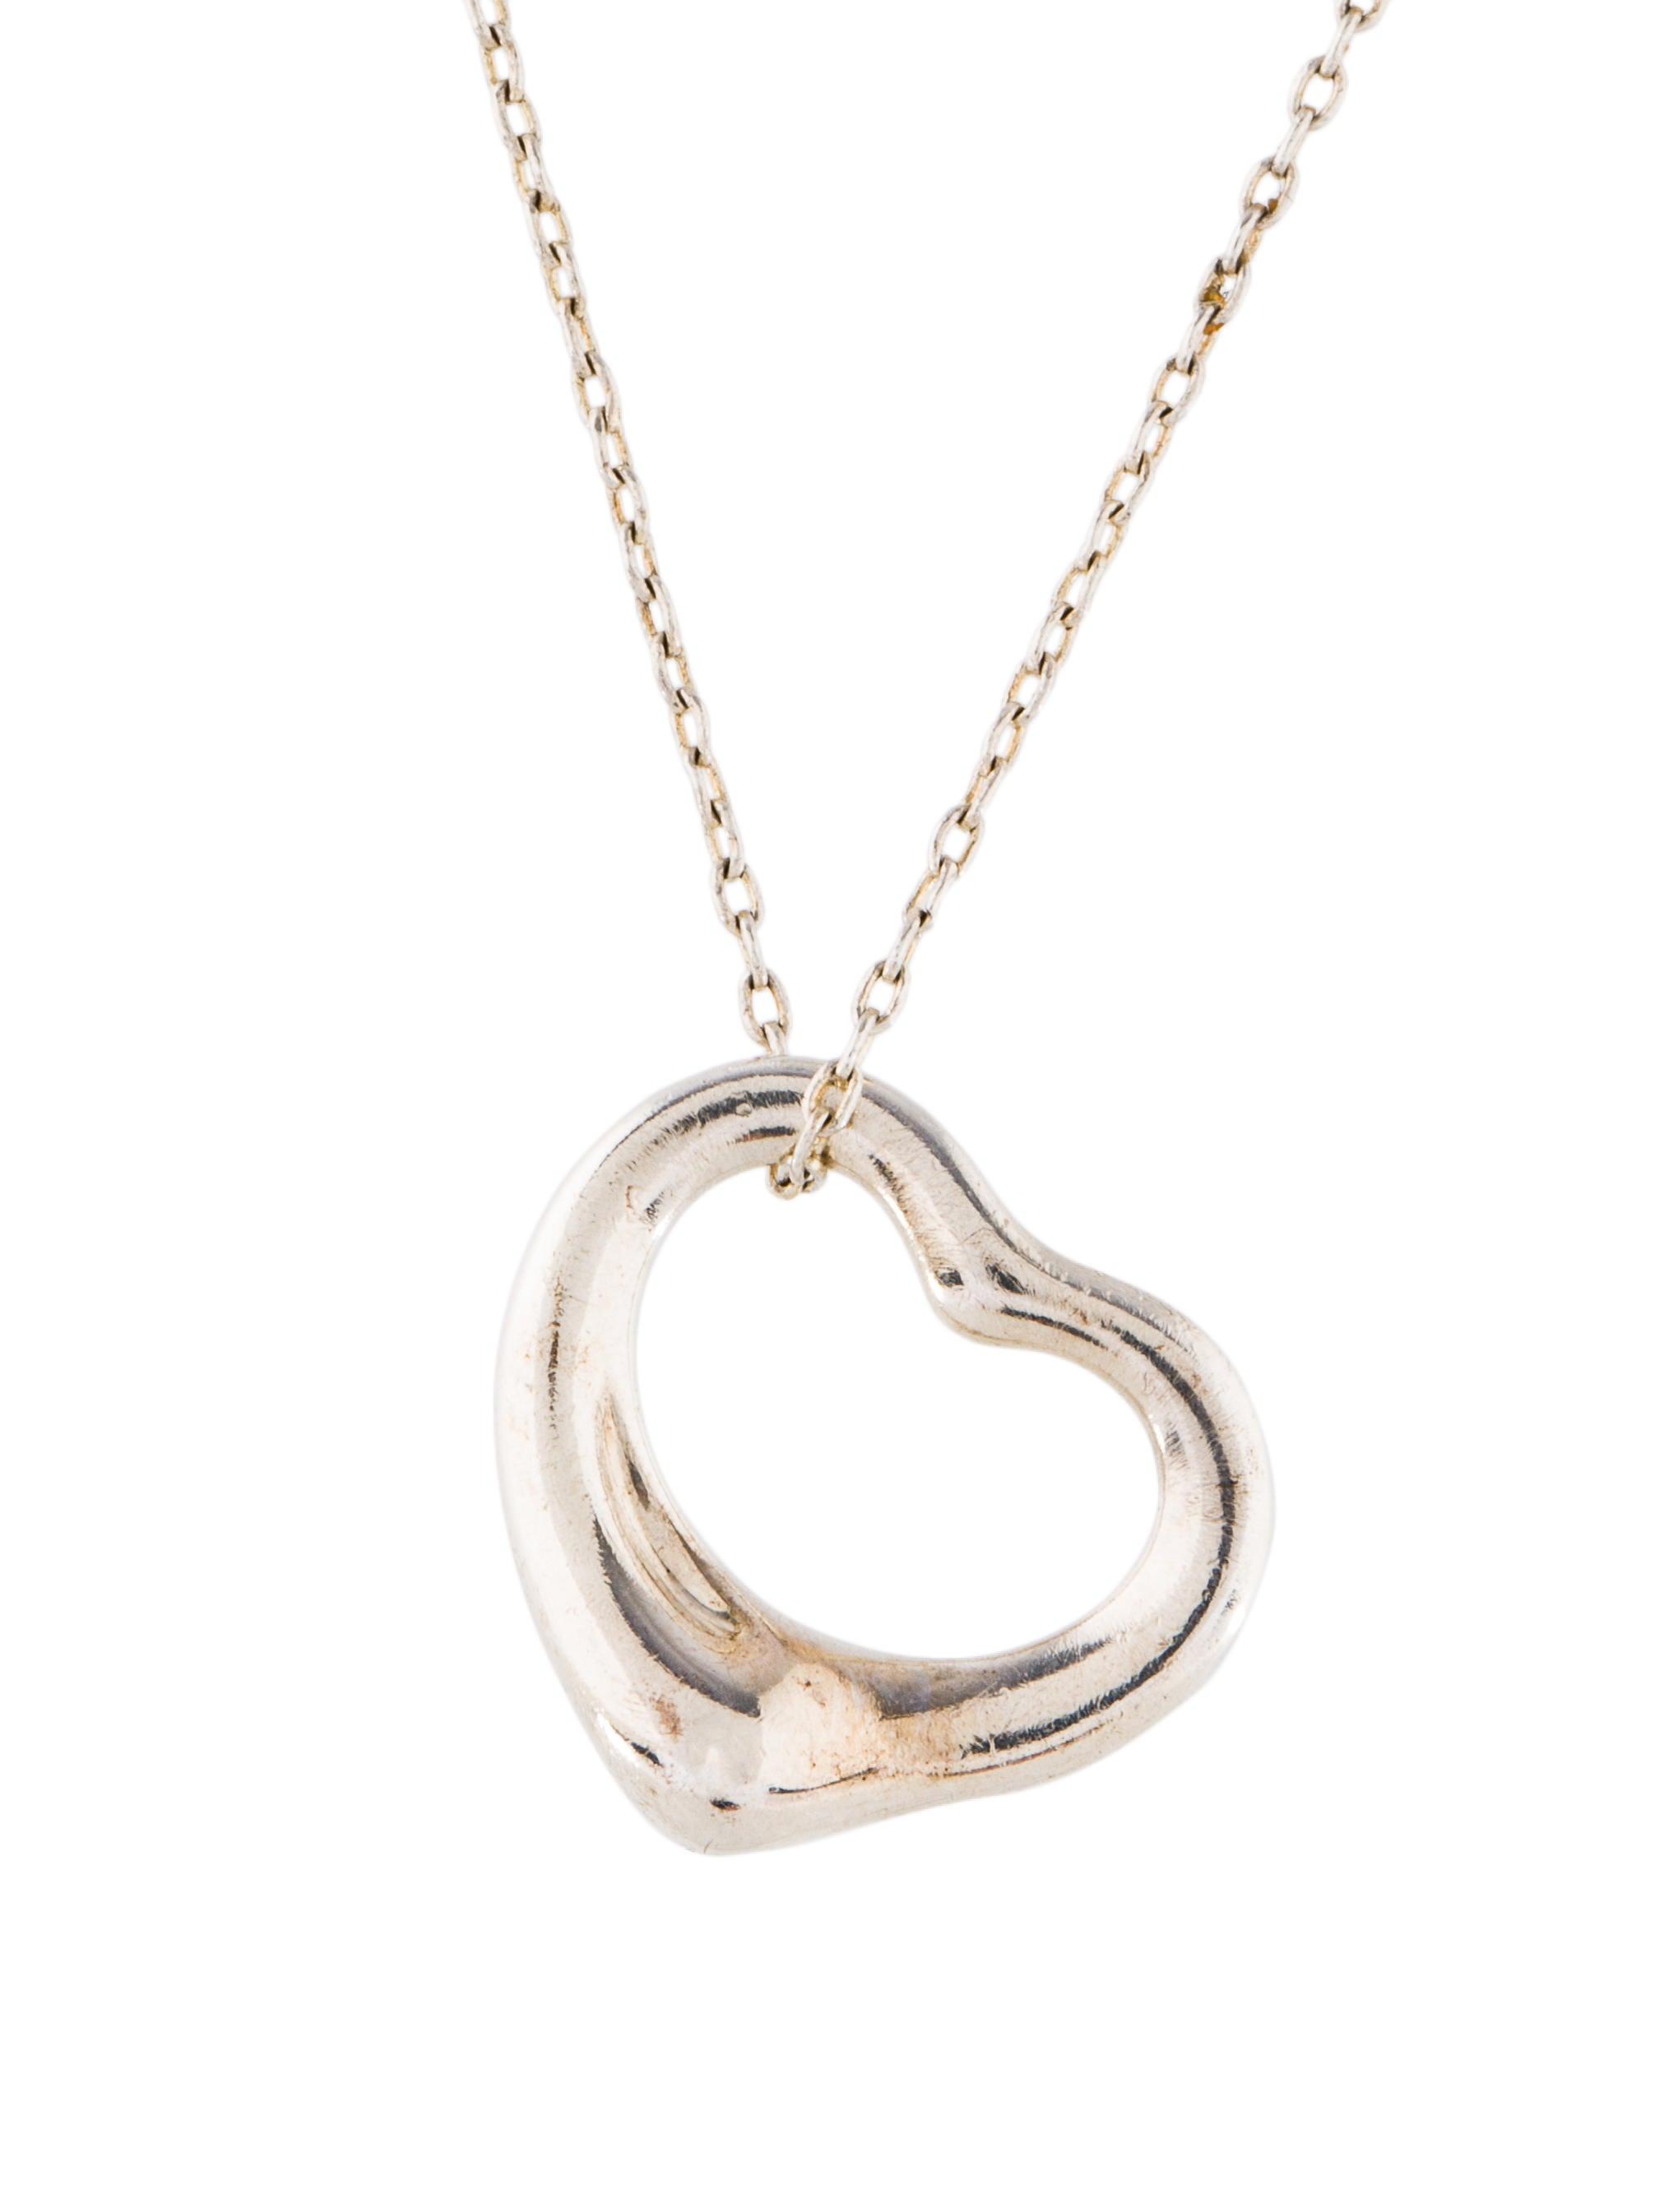 Tiffany co open heart pendant necklace necklaces tif68259 open heart pendant necklace aloadofball Gallery